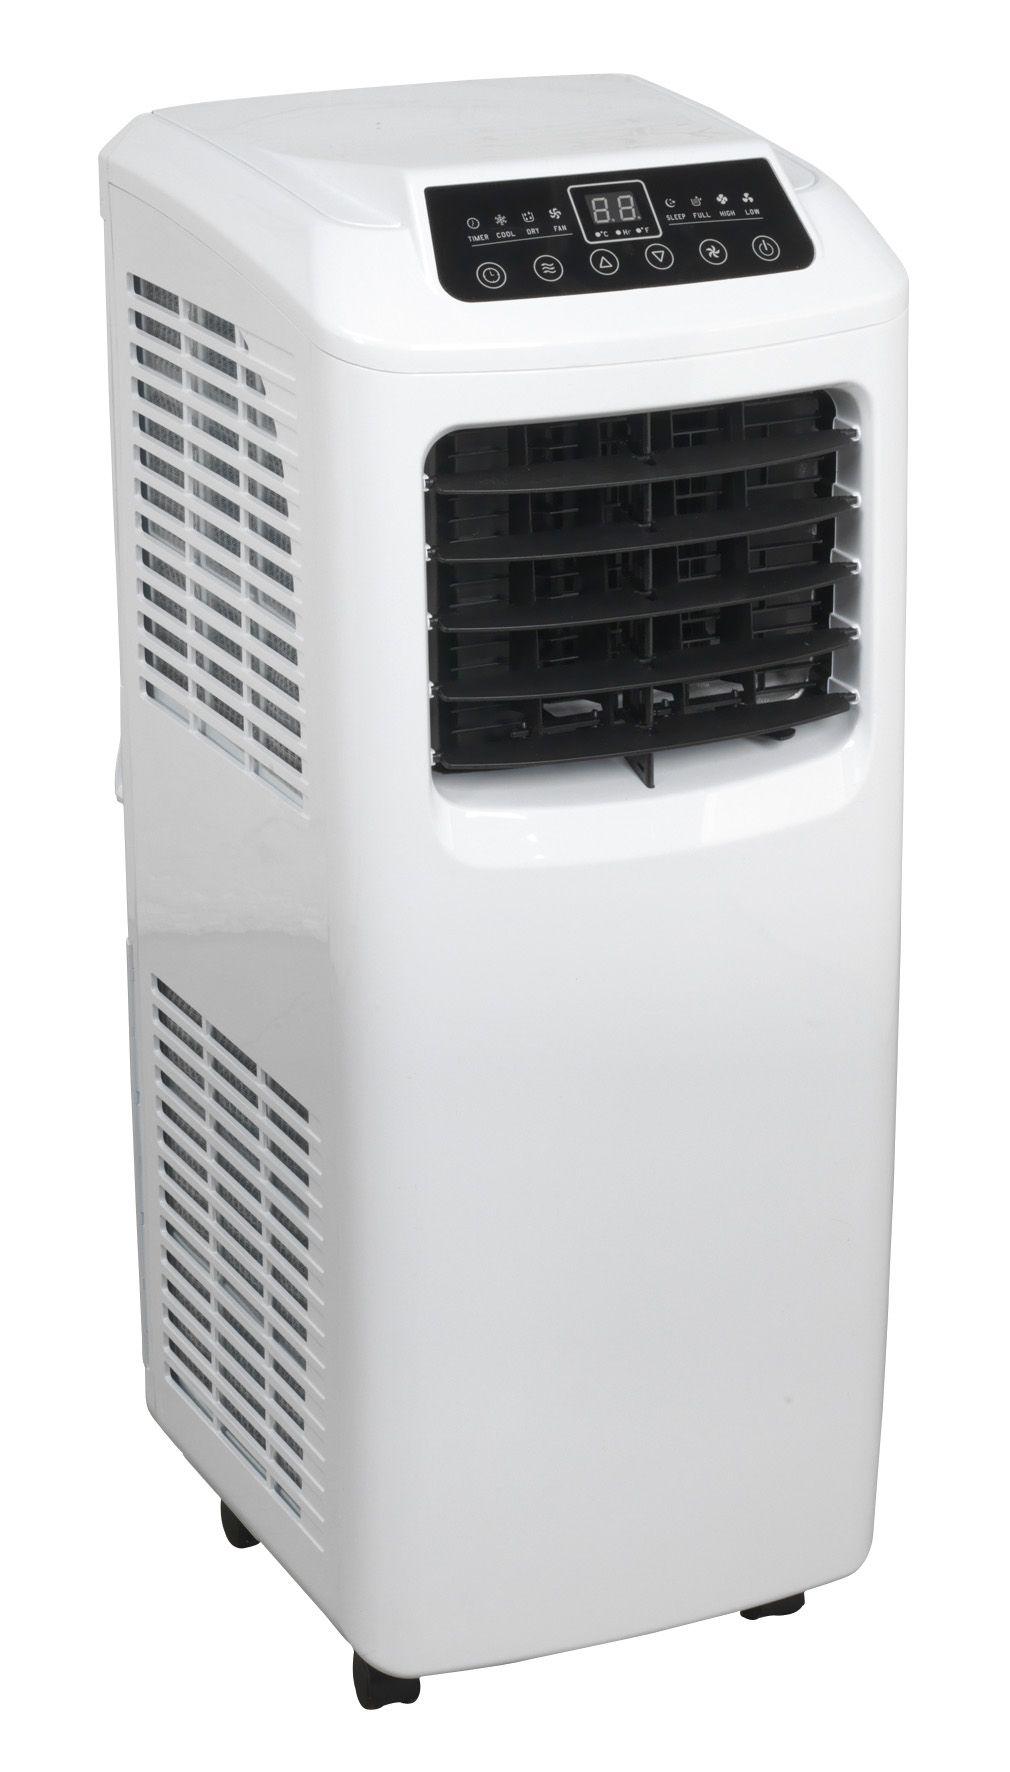 Sealey Air Conditioner/Dehumidifier 9,000Btu/hr